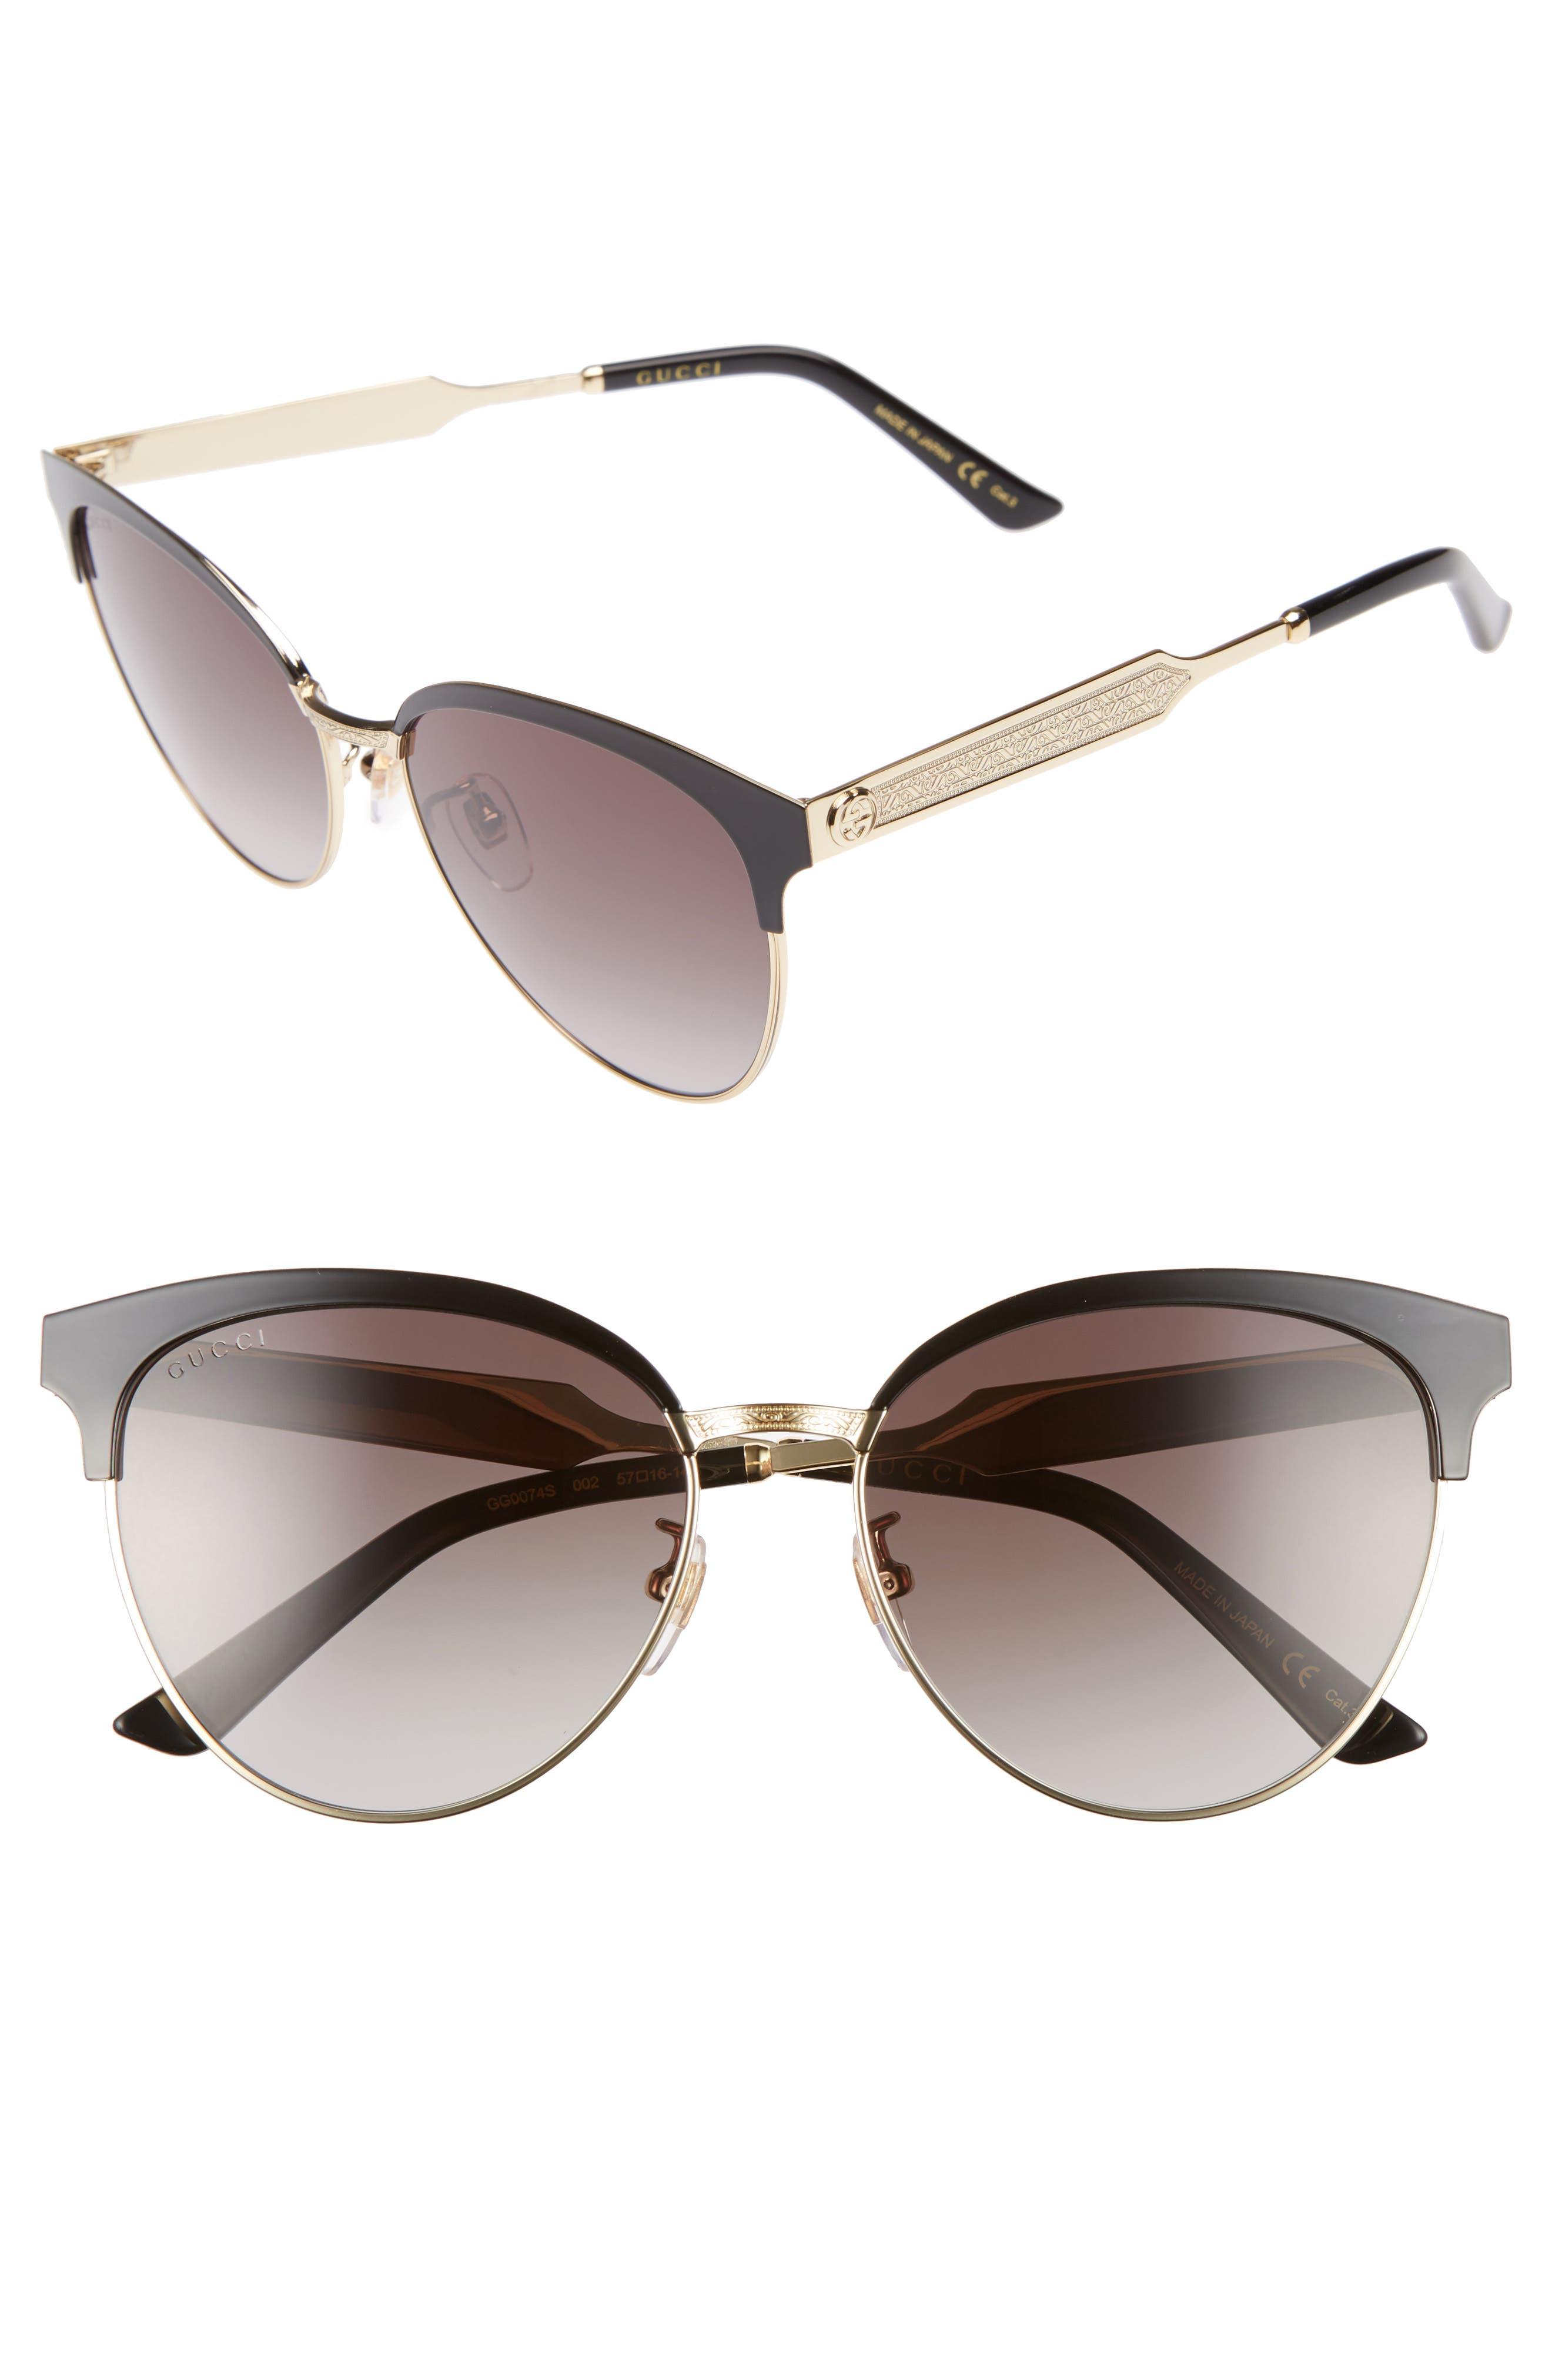 57mm Retro Sunglasses,                             Main thumbnail 1, color,                             001